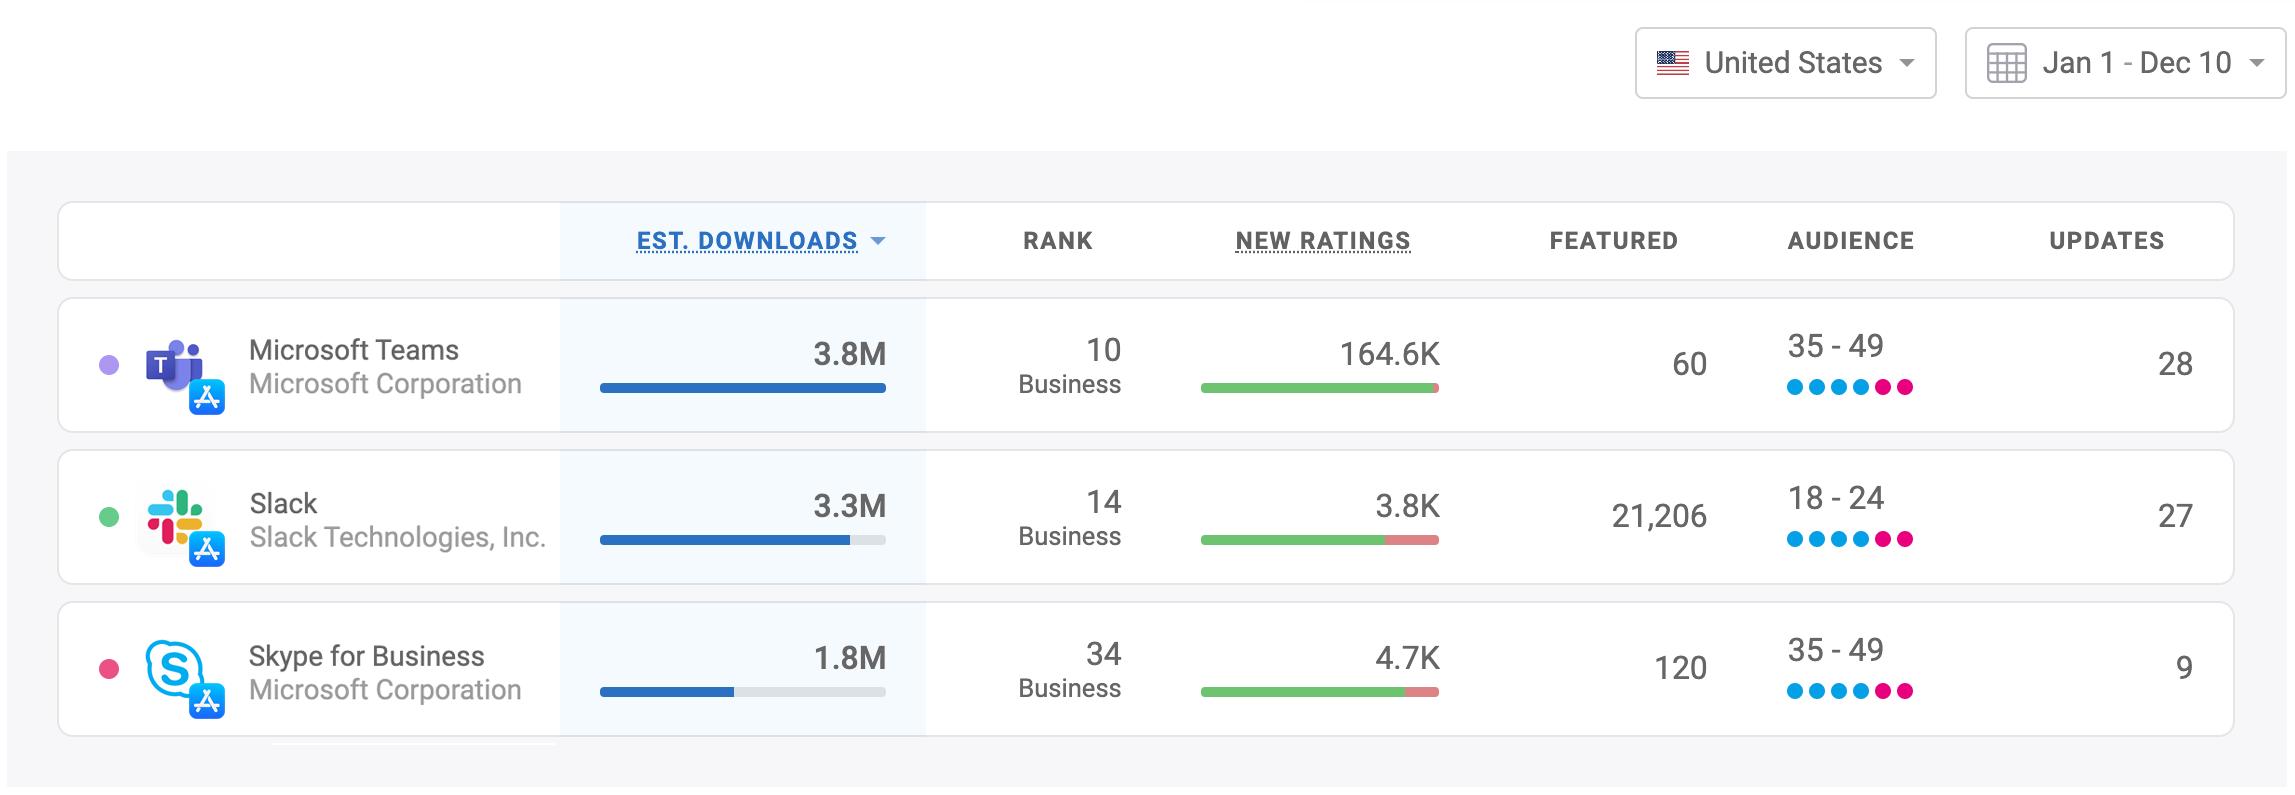 Download performance - Slack vs Microsoft Teams vs Slack for Business